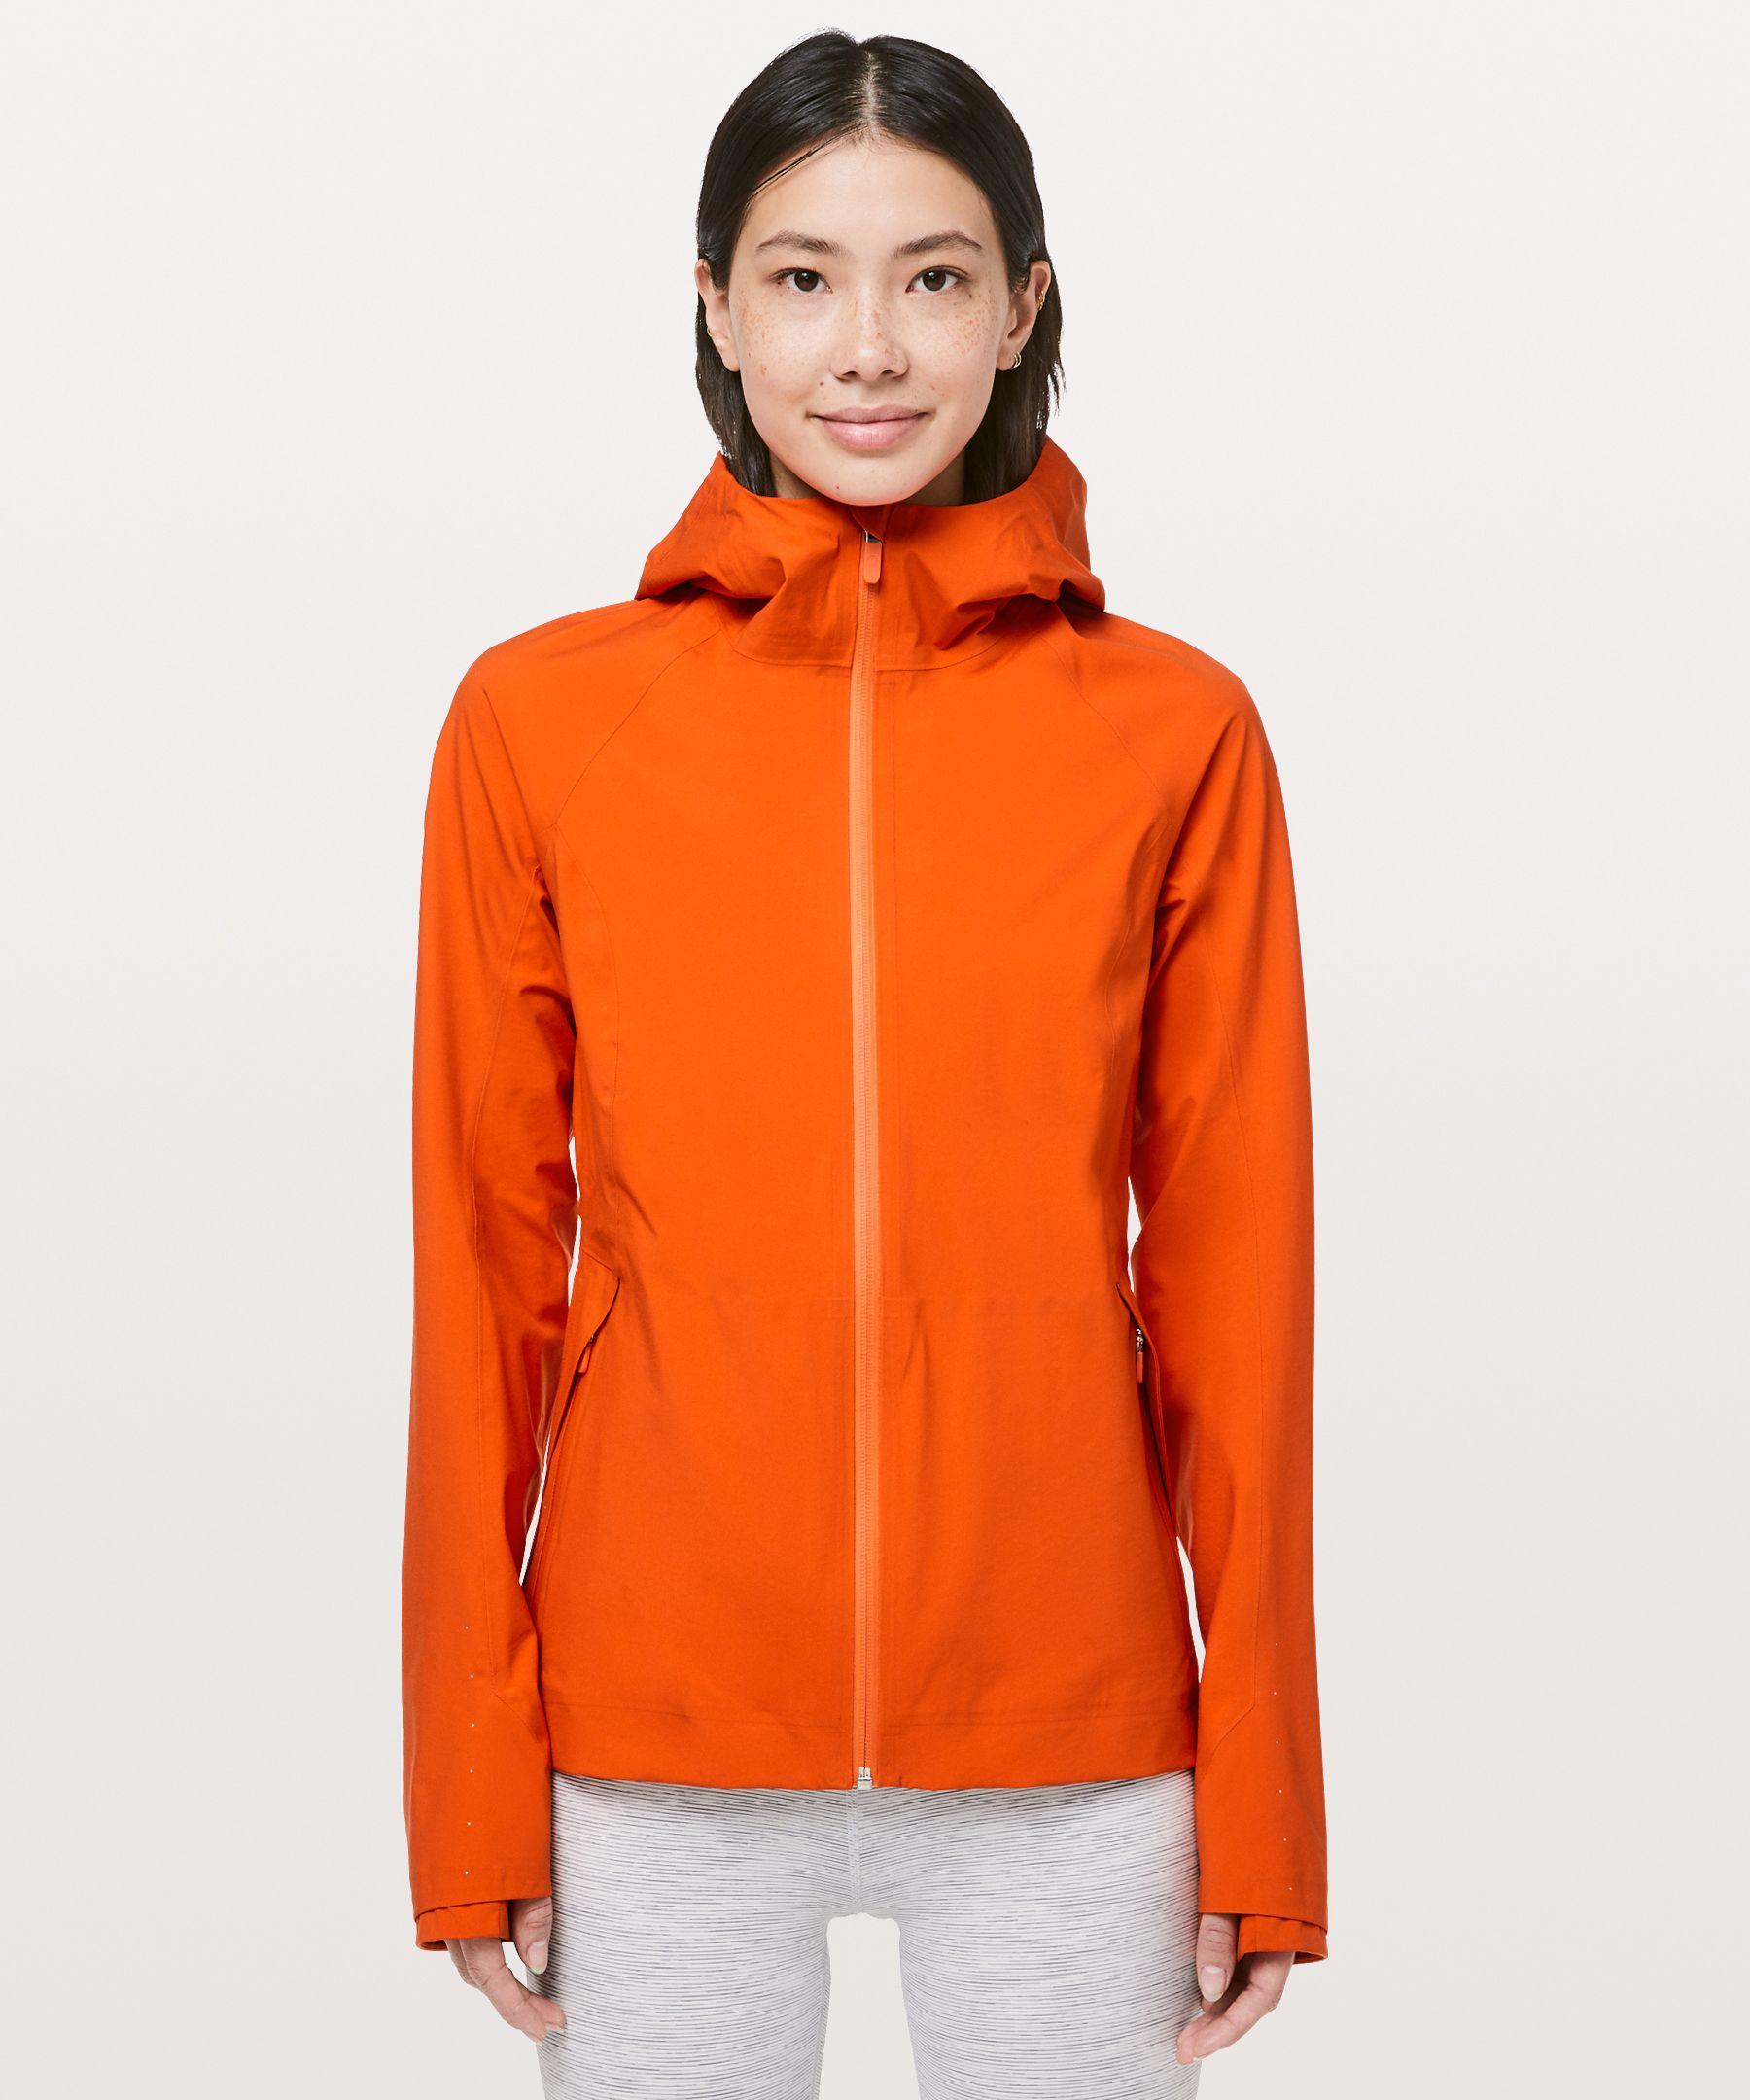 Lululemon The Rain Is Calling Jacket Ii In Atomic Orange